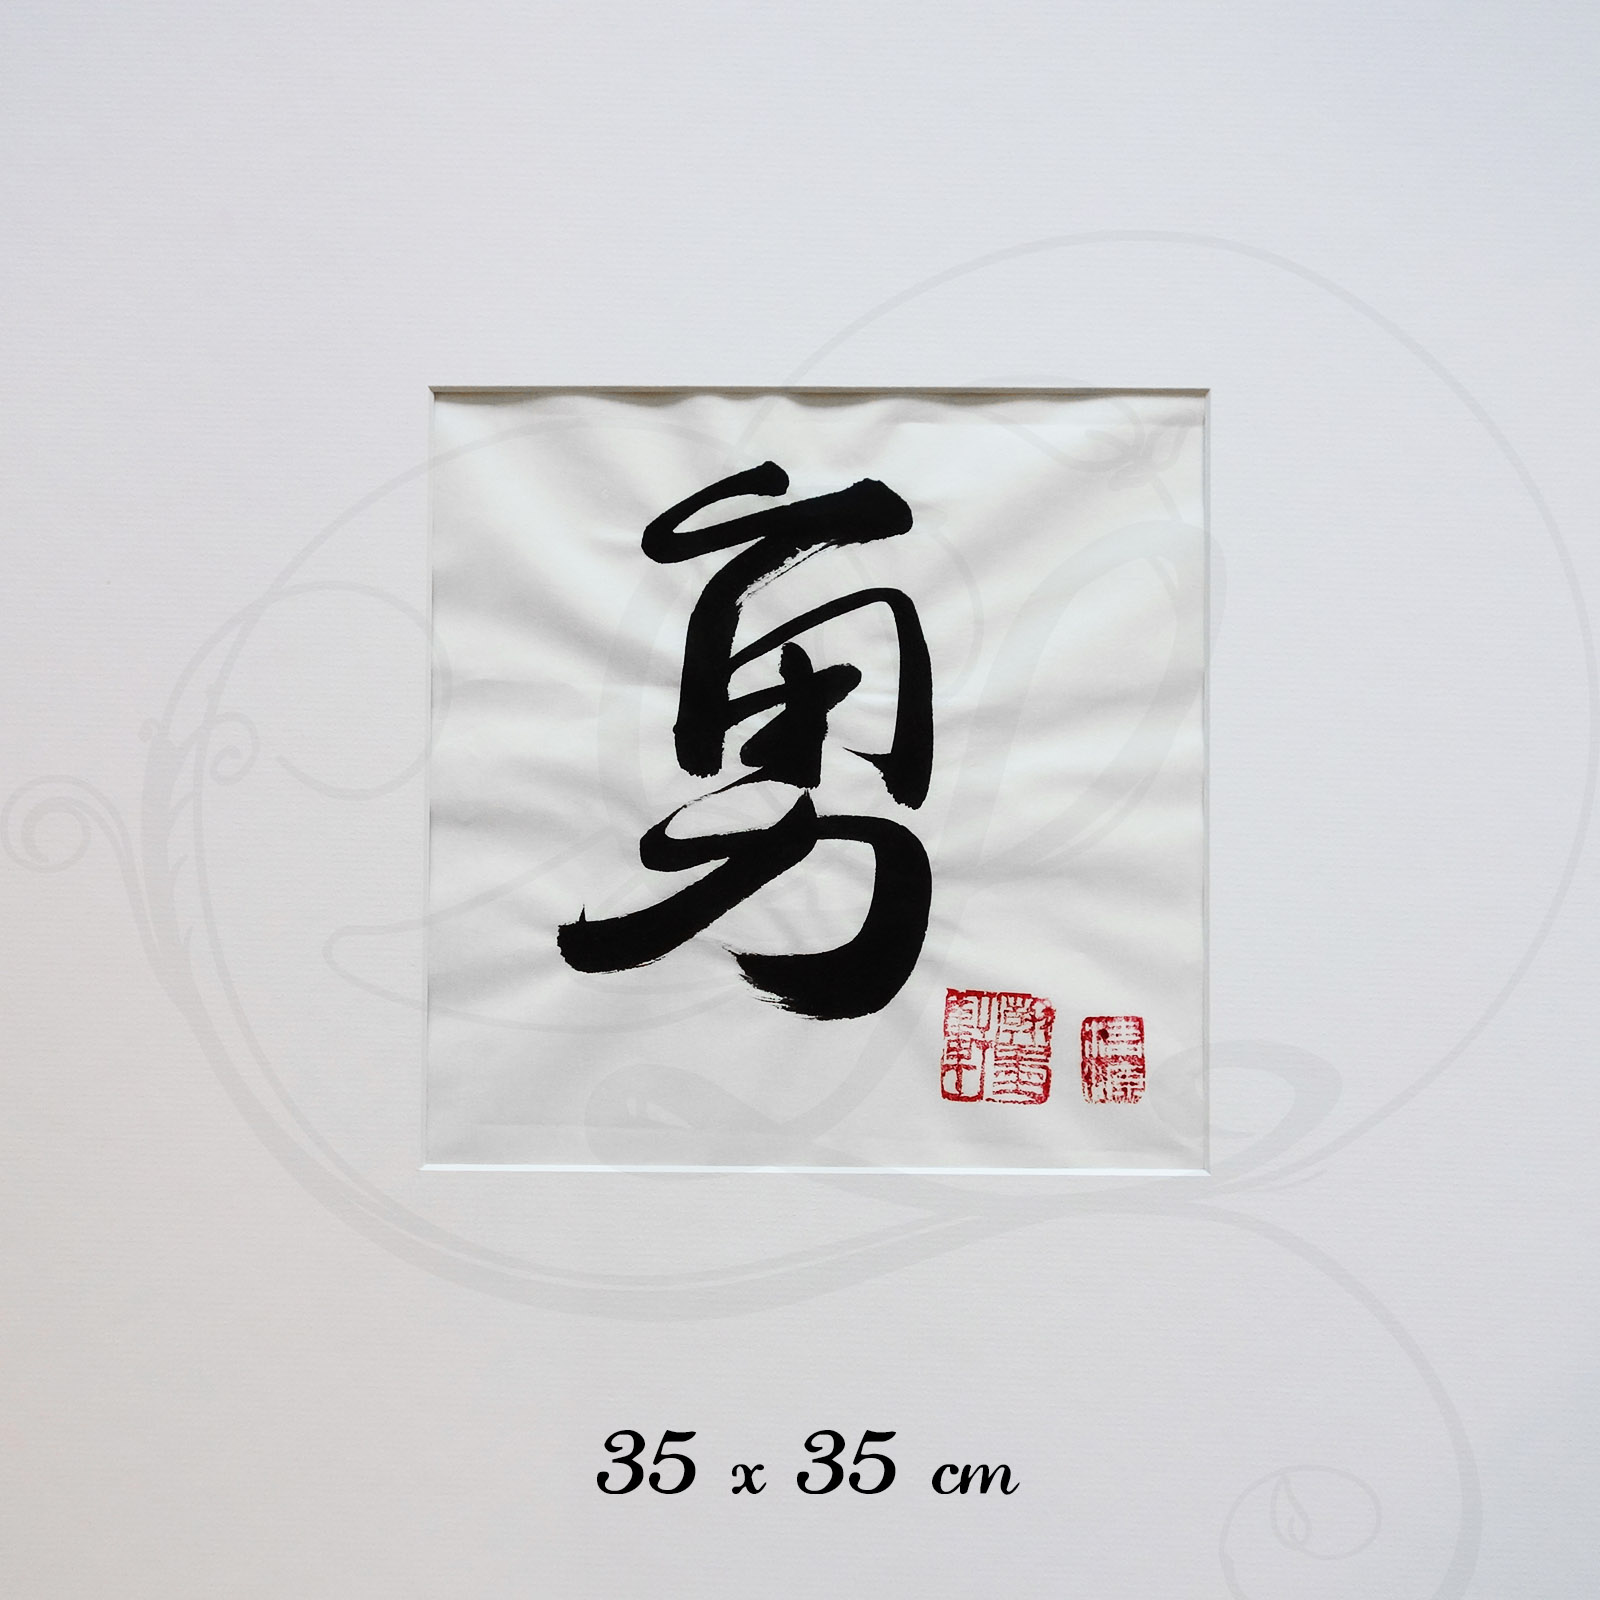 calligraphie-chinoise-vertus-xing-shu-courage-grand-format